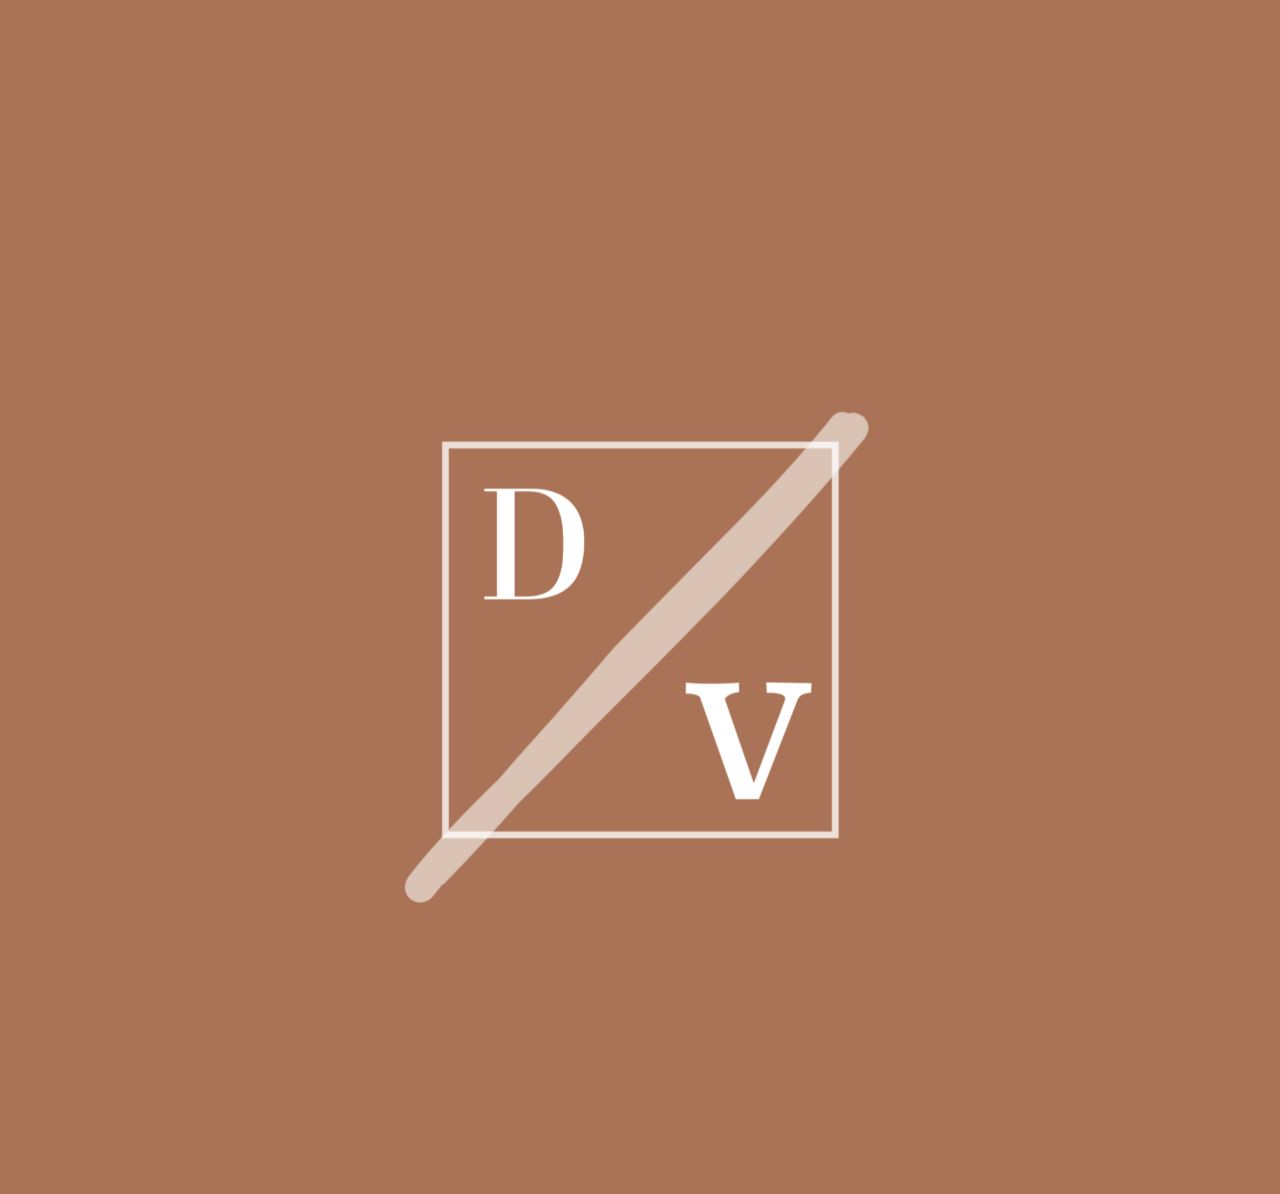 Dolce & Vita Cosmetics